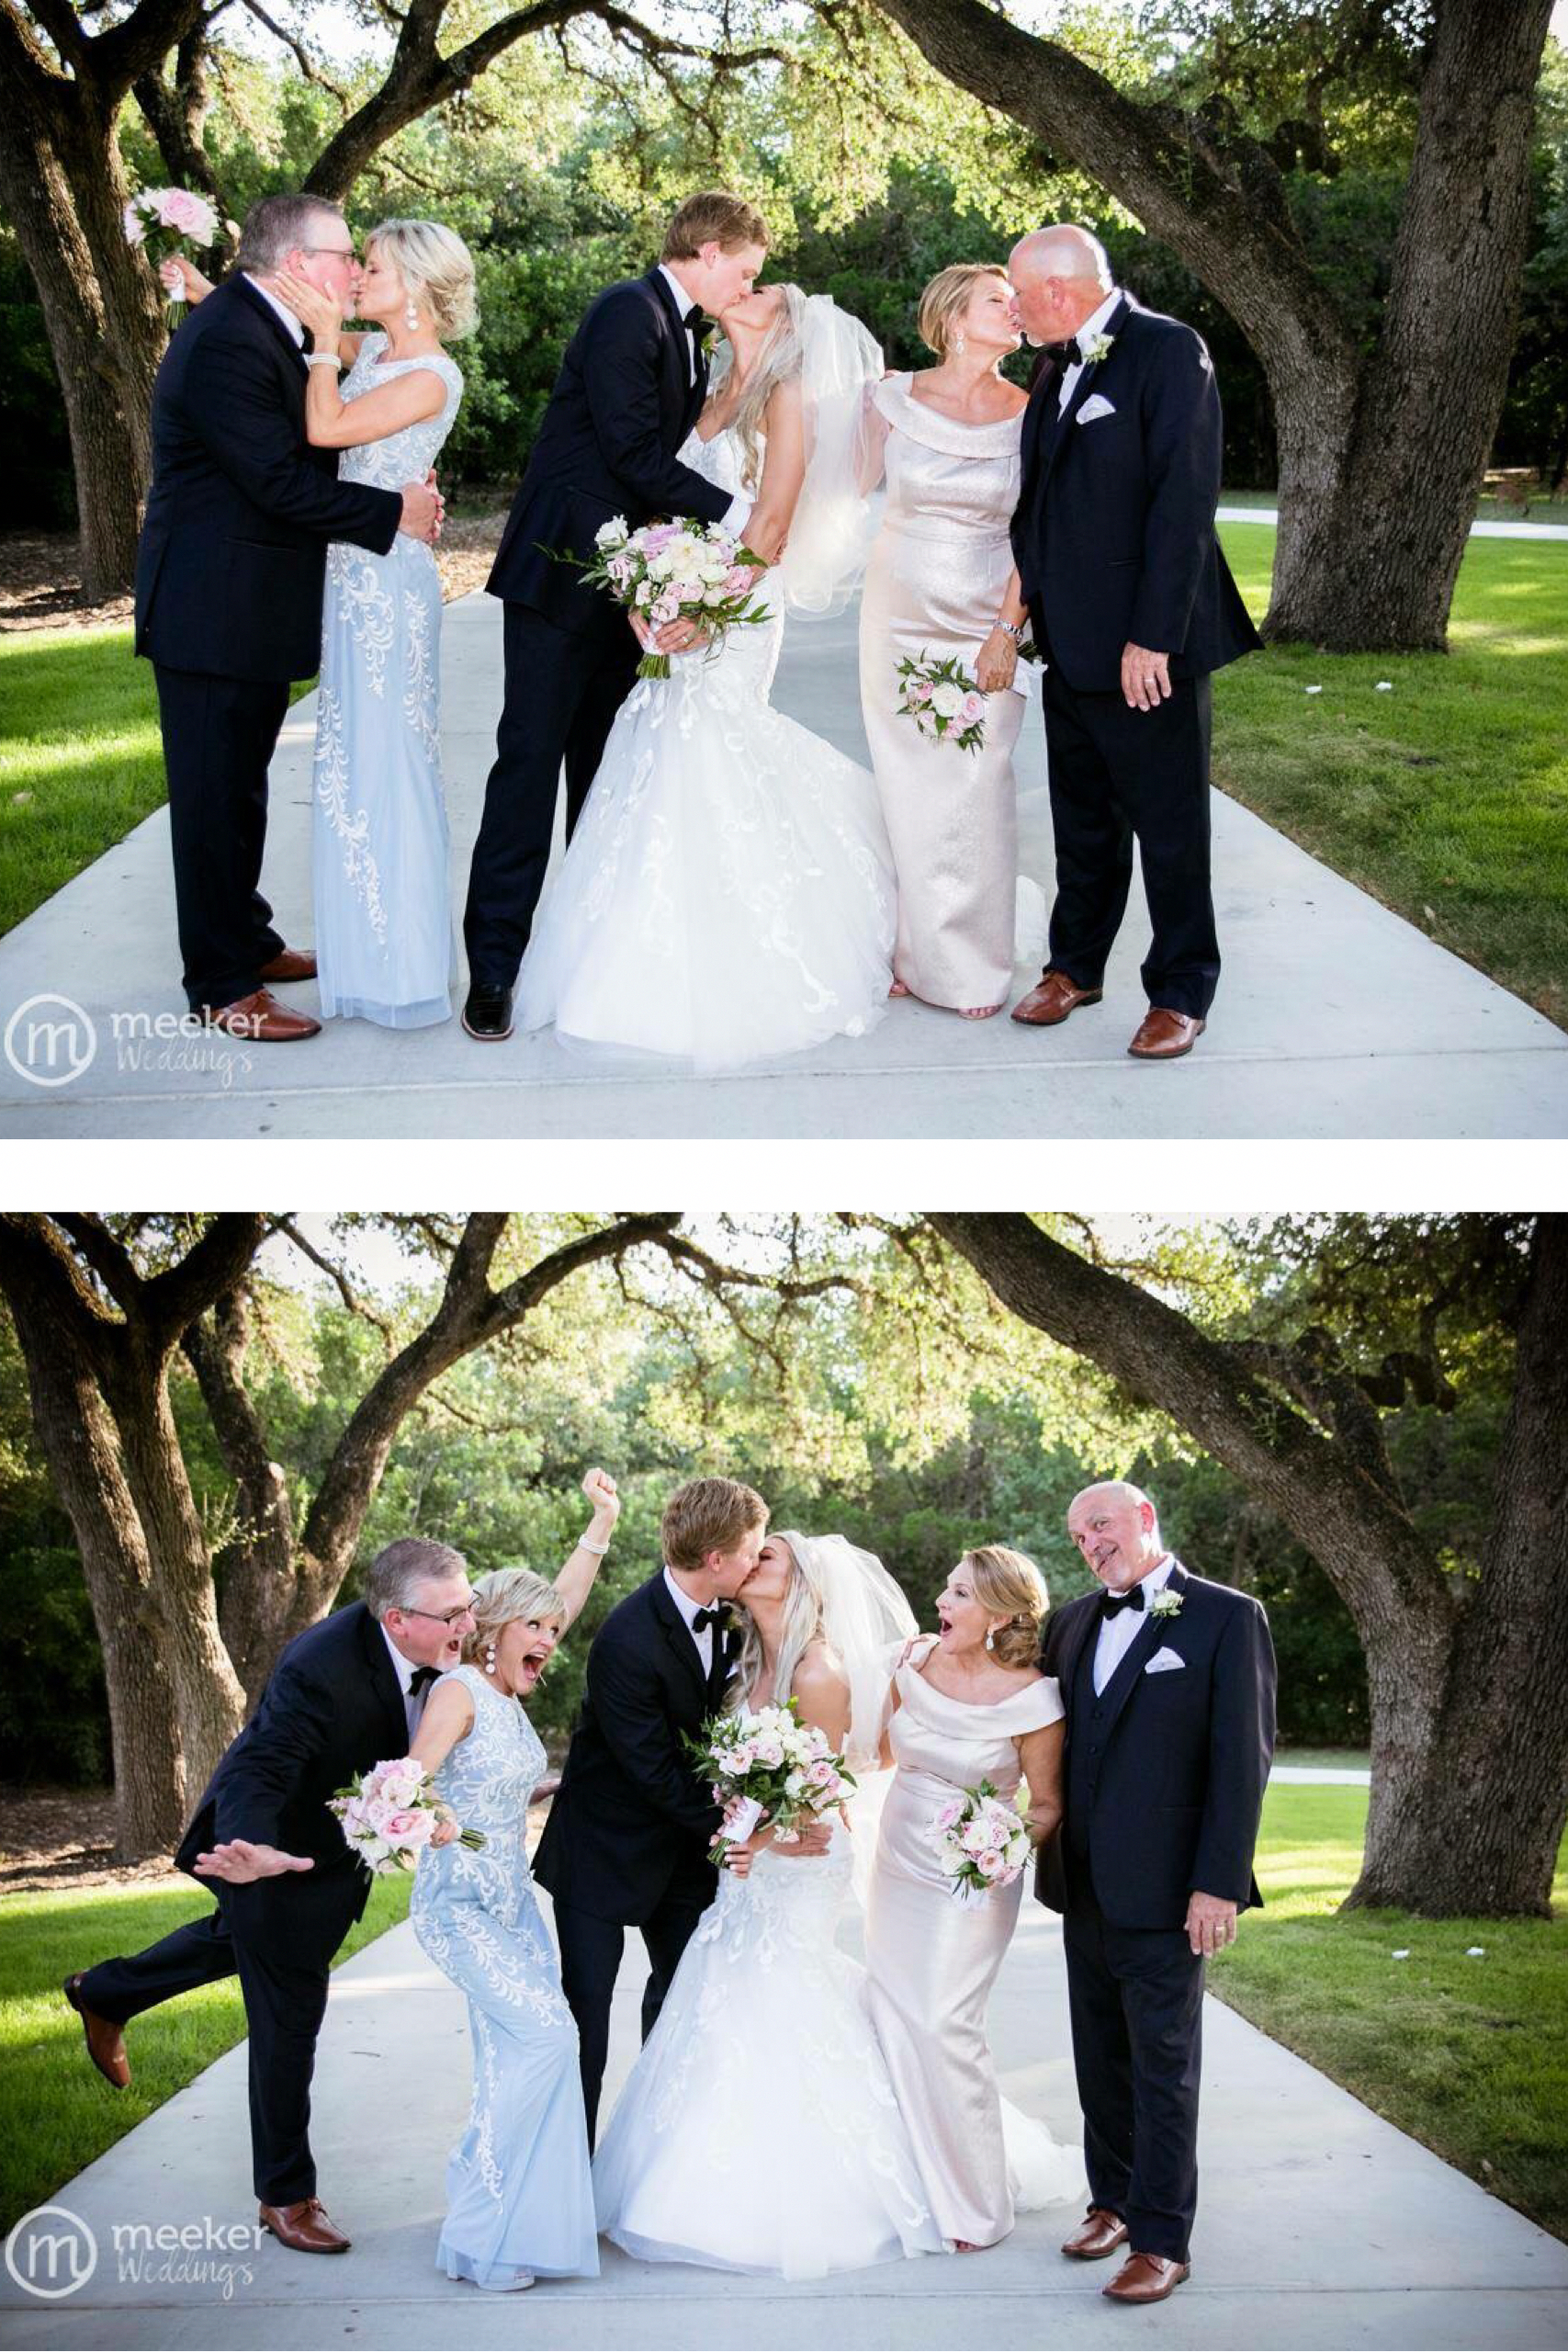 brideandgroomweddingphotography | wedding picture poses